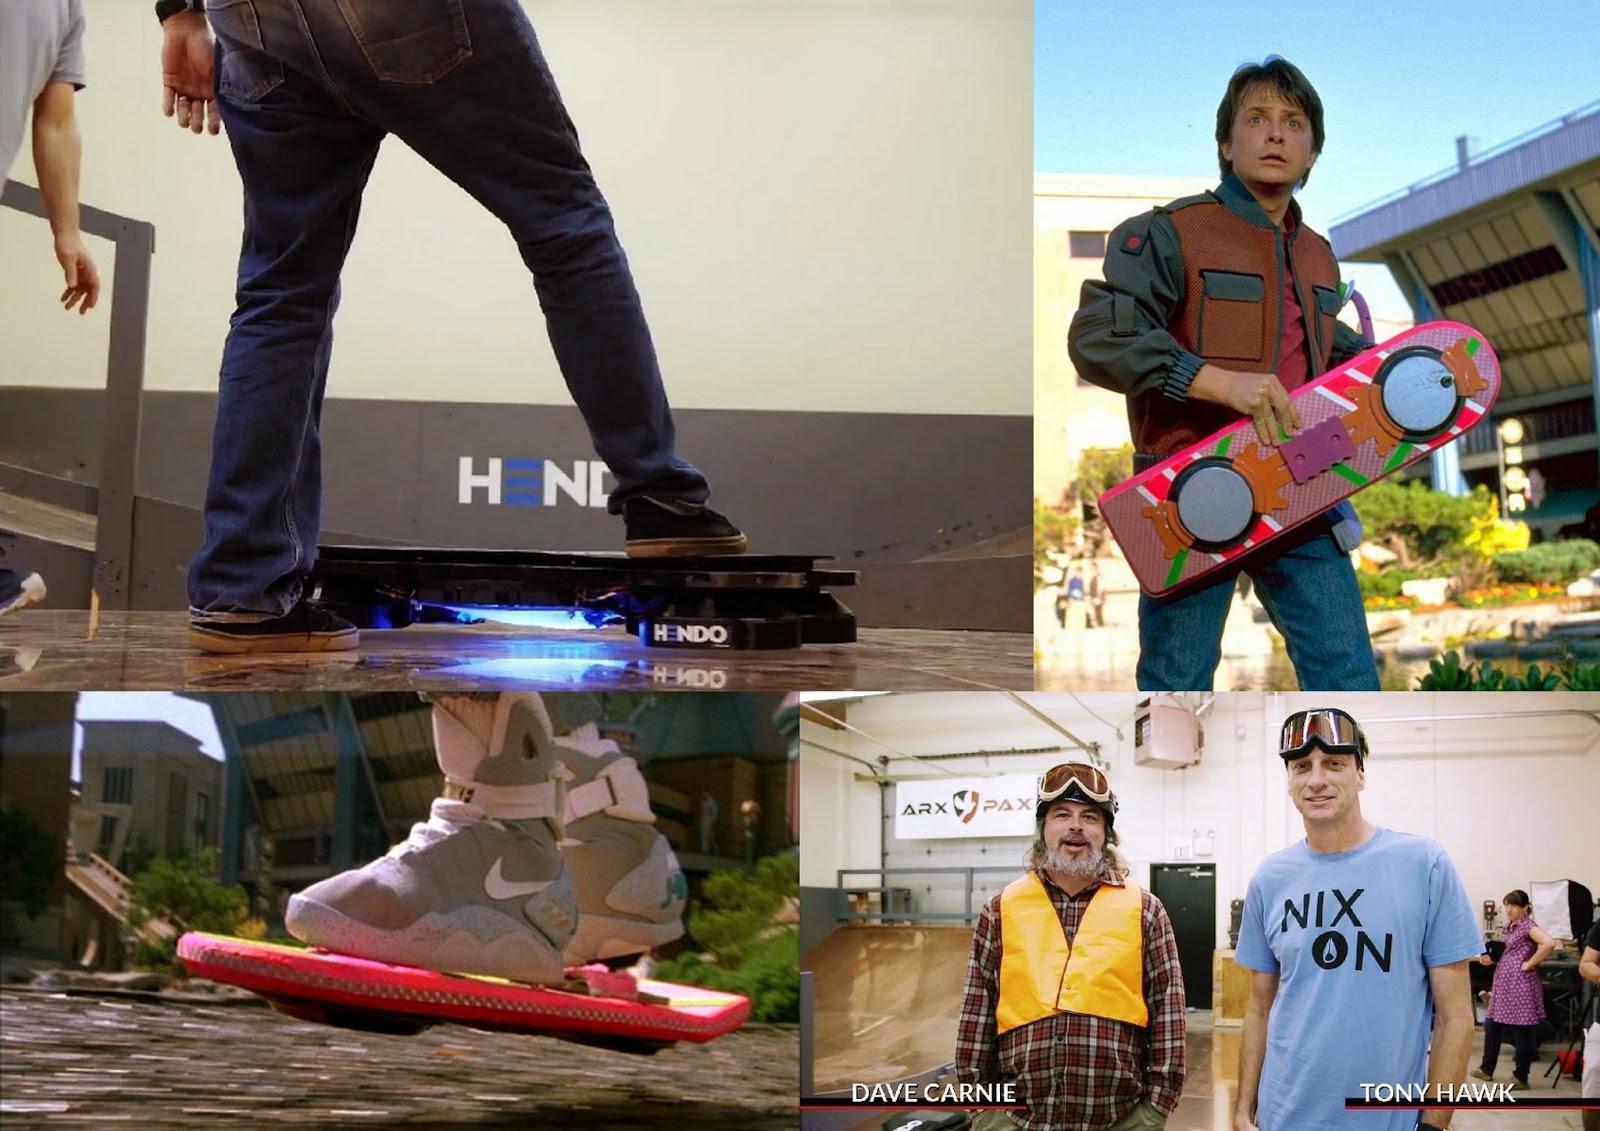 Hoverboard,De Volta para o Futuro, Skate sem rodas,Skate Flutuante, Hendo Hoverboard,Tony Hawk,Mcfly